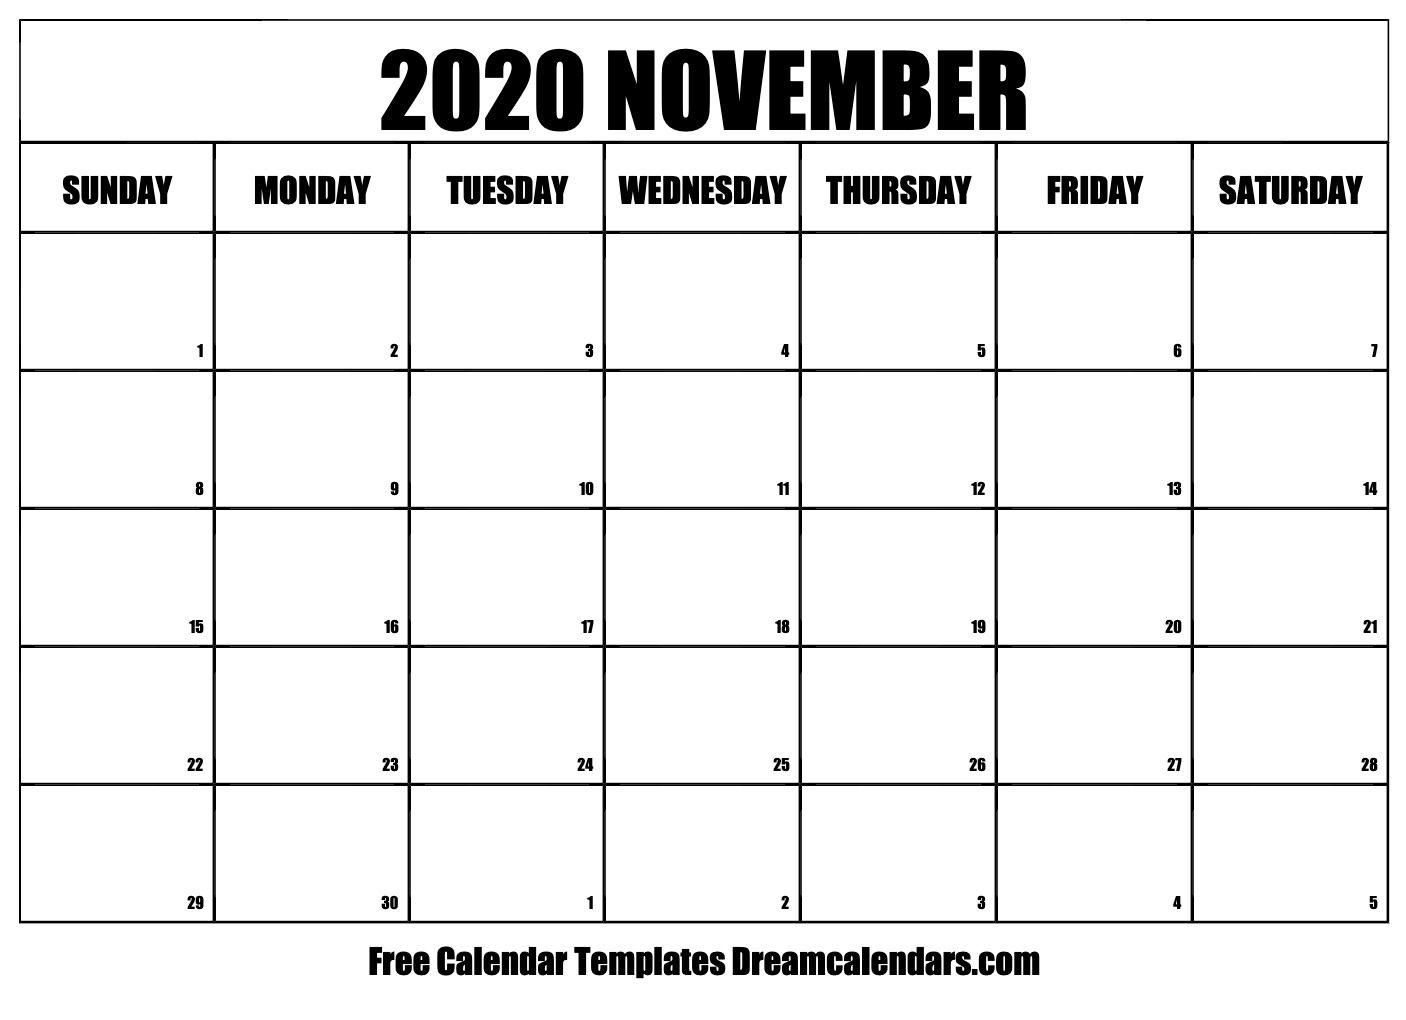 November 2020 Calendar | Free Calendar Template, Calendar regarding November 2020 Calendar Beta Calendars